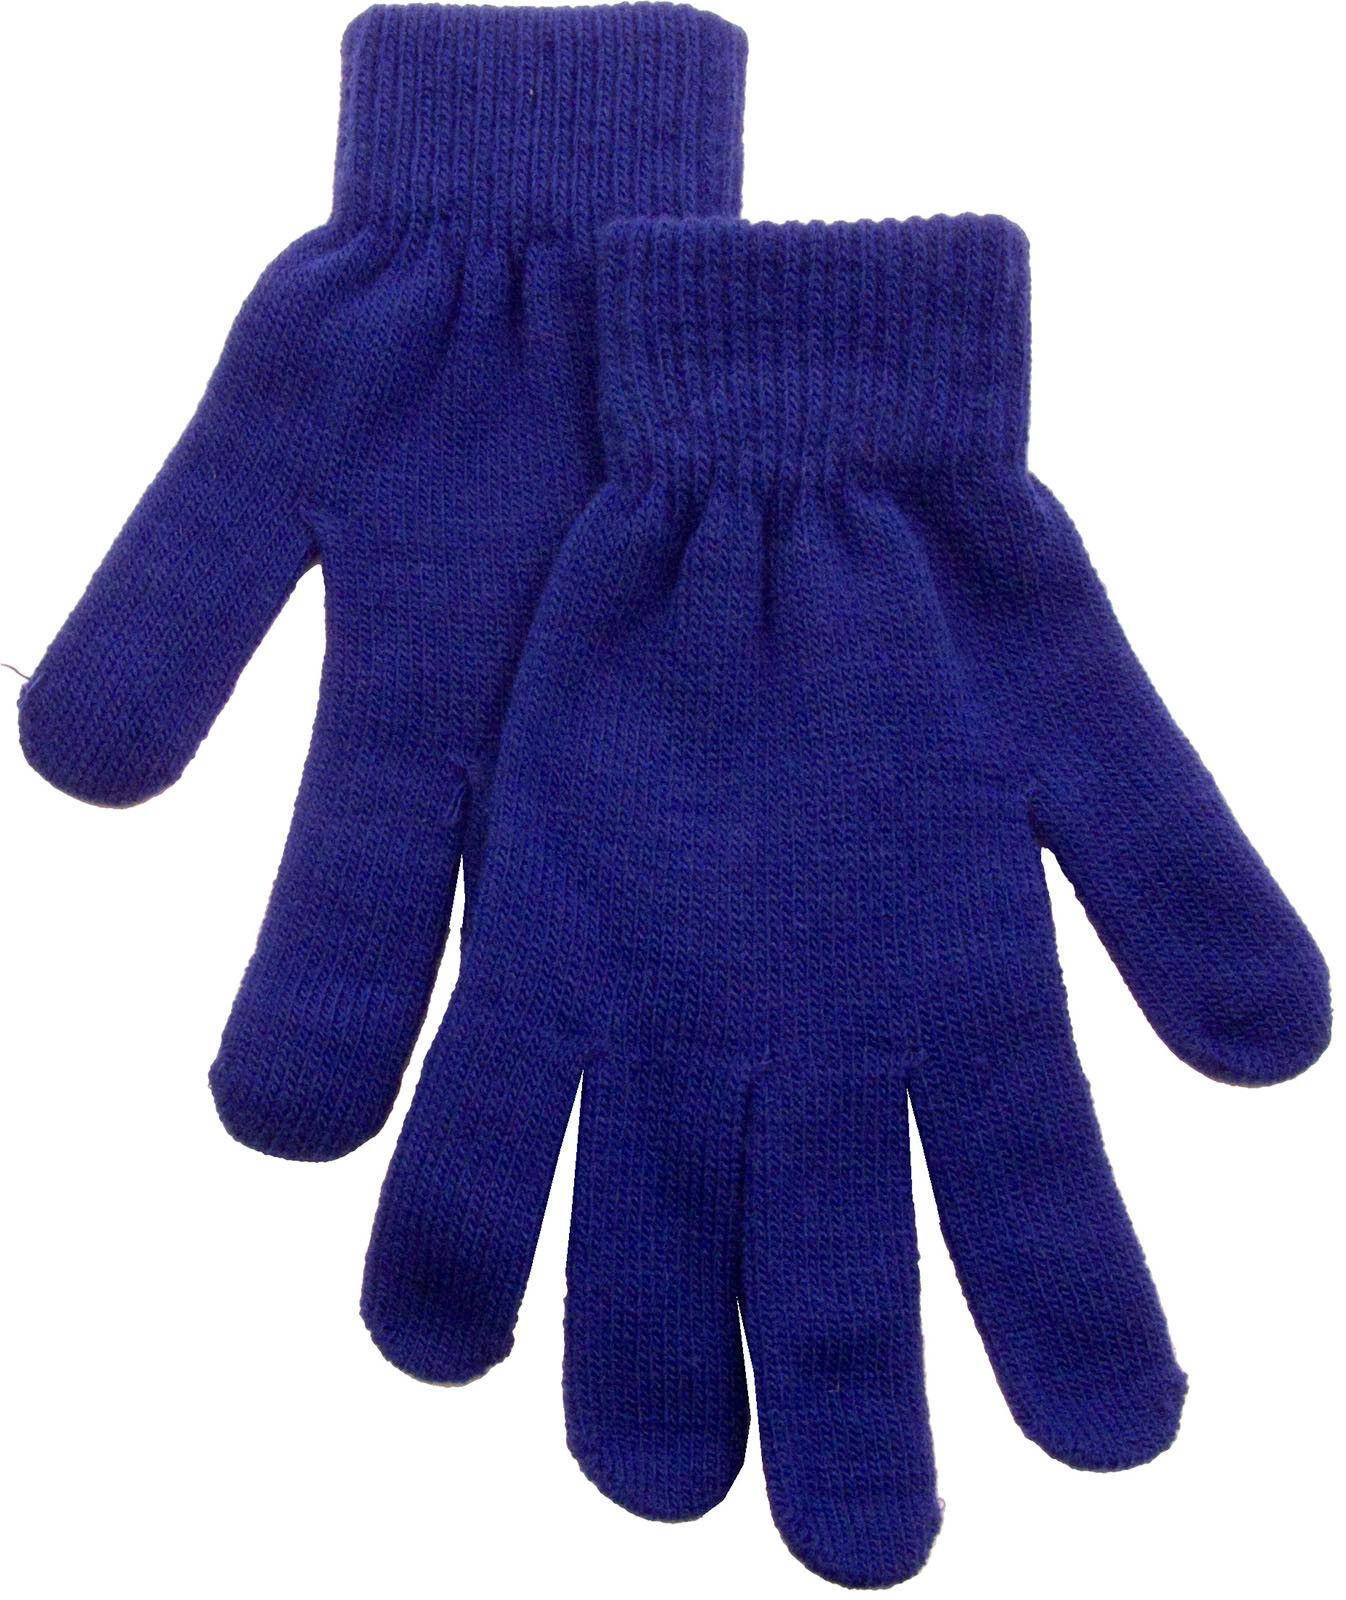 Soft Winter Men Women Gloves Solid Warmer Knitted Acrylic Mi